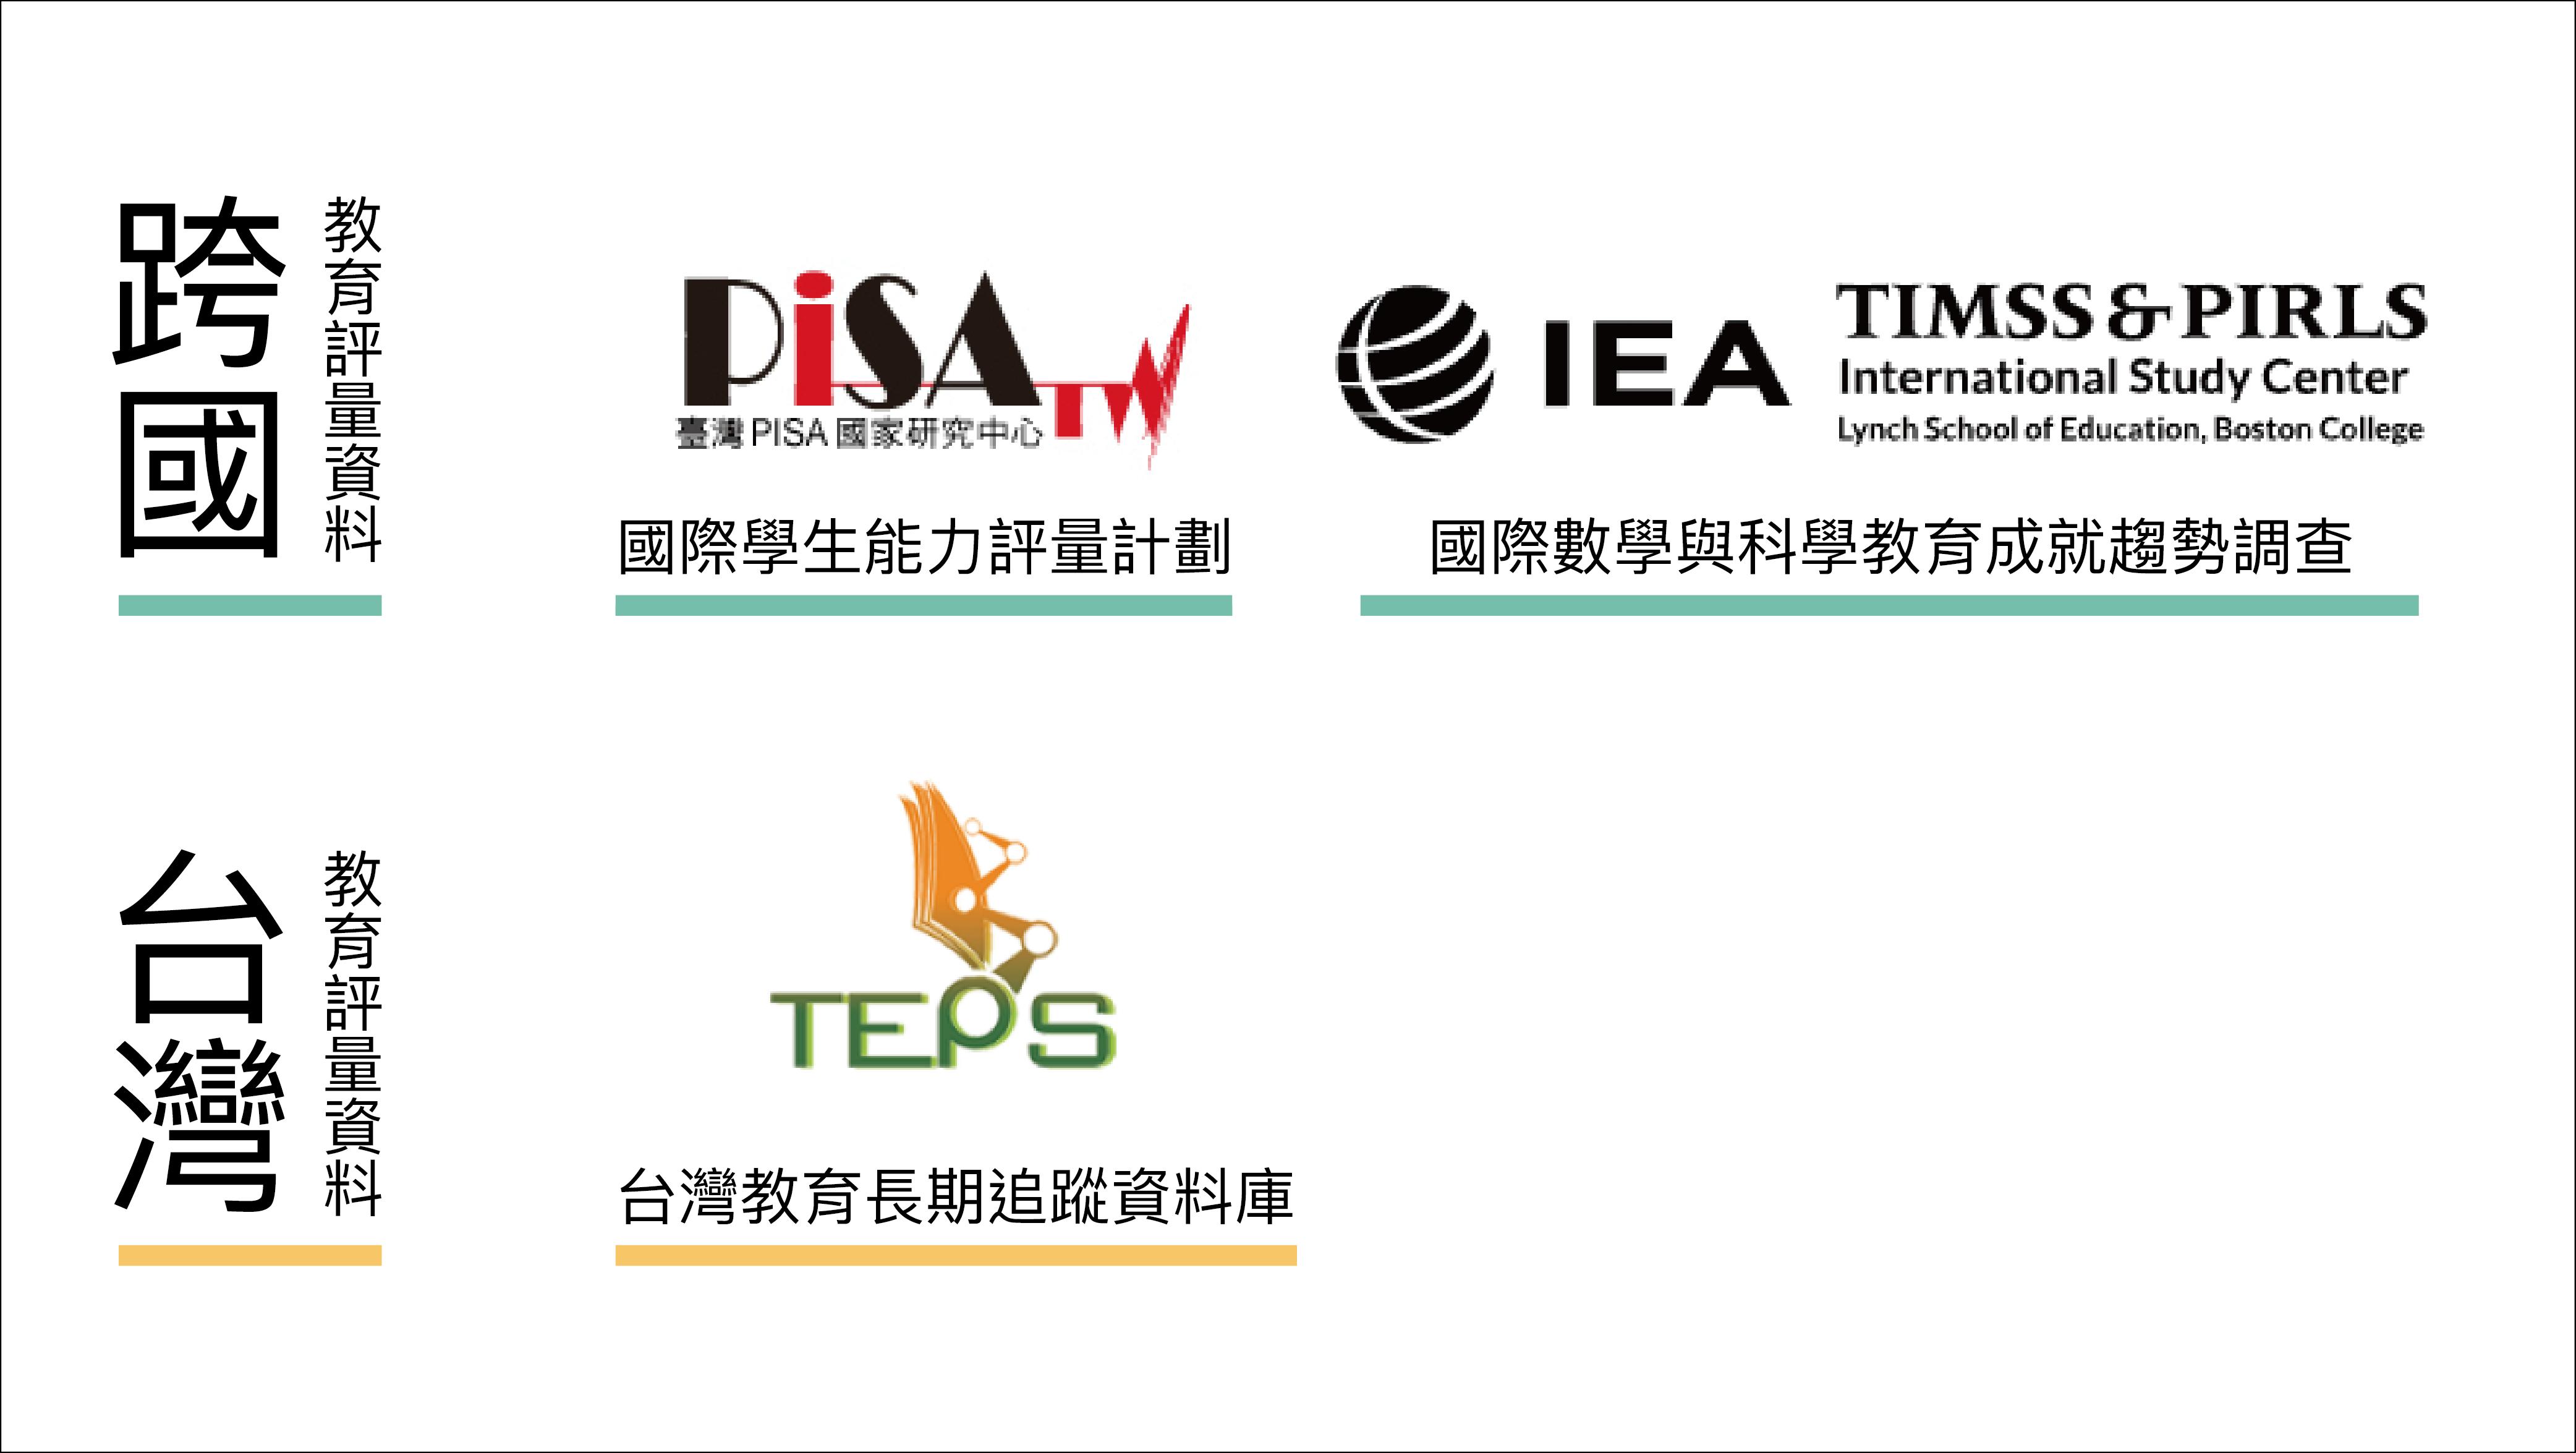 跨國資料主要包含兩項,分別是 the Programme for International Student Assessment (簡稱 PISA) 和 Trends in International Mathematics and Science Study (簡稱 TIMSS) 。另一個本土、台灣自己建構的,叫作Taiwan Education Panel Survey (簡稱 TEPS)。圖│研之有物(資料來源│黃敏雄)